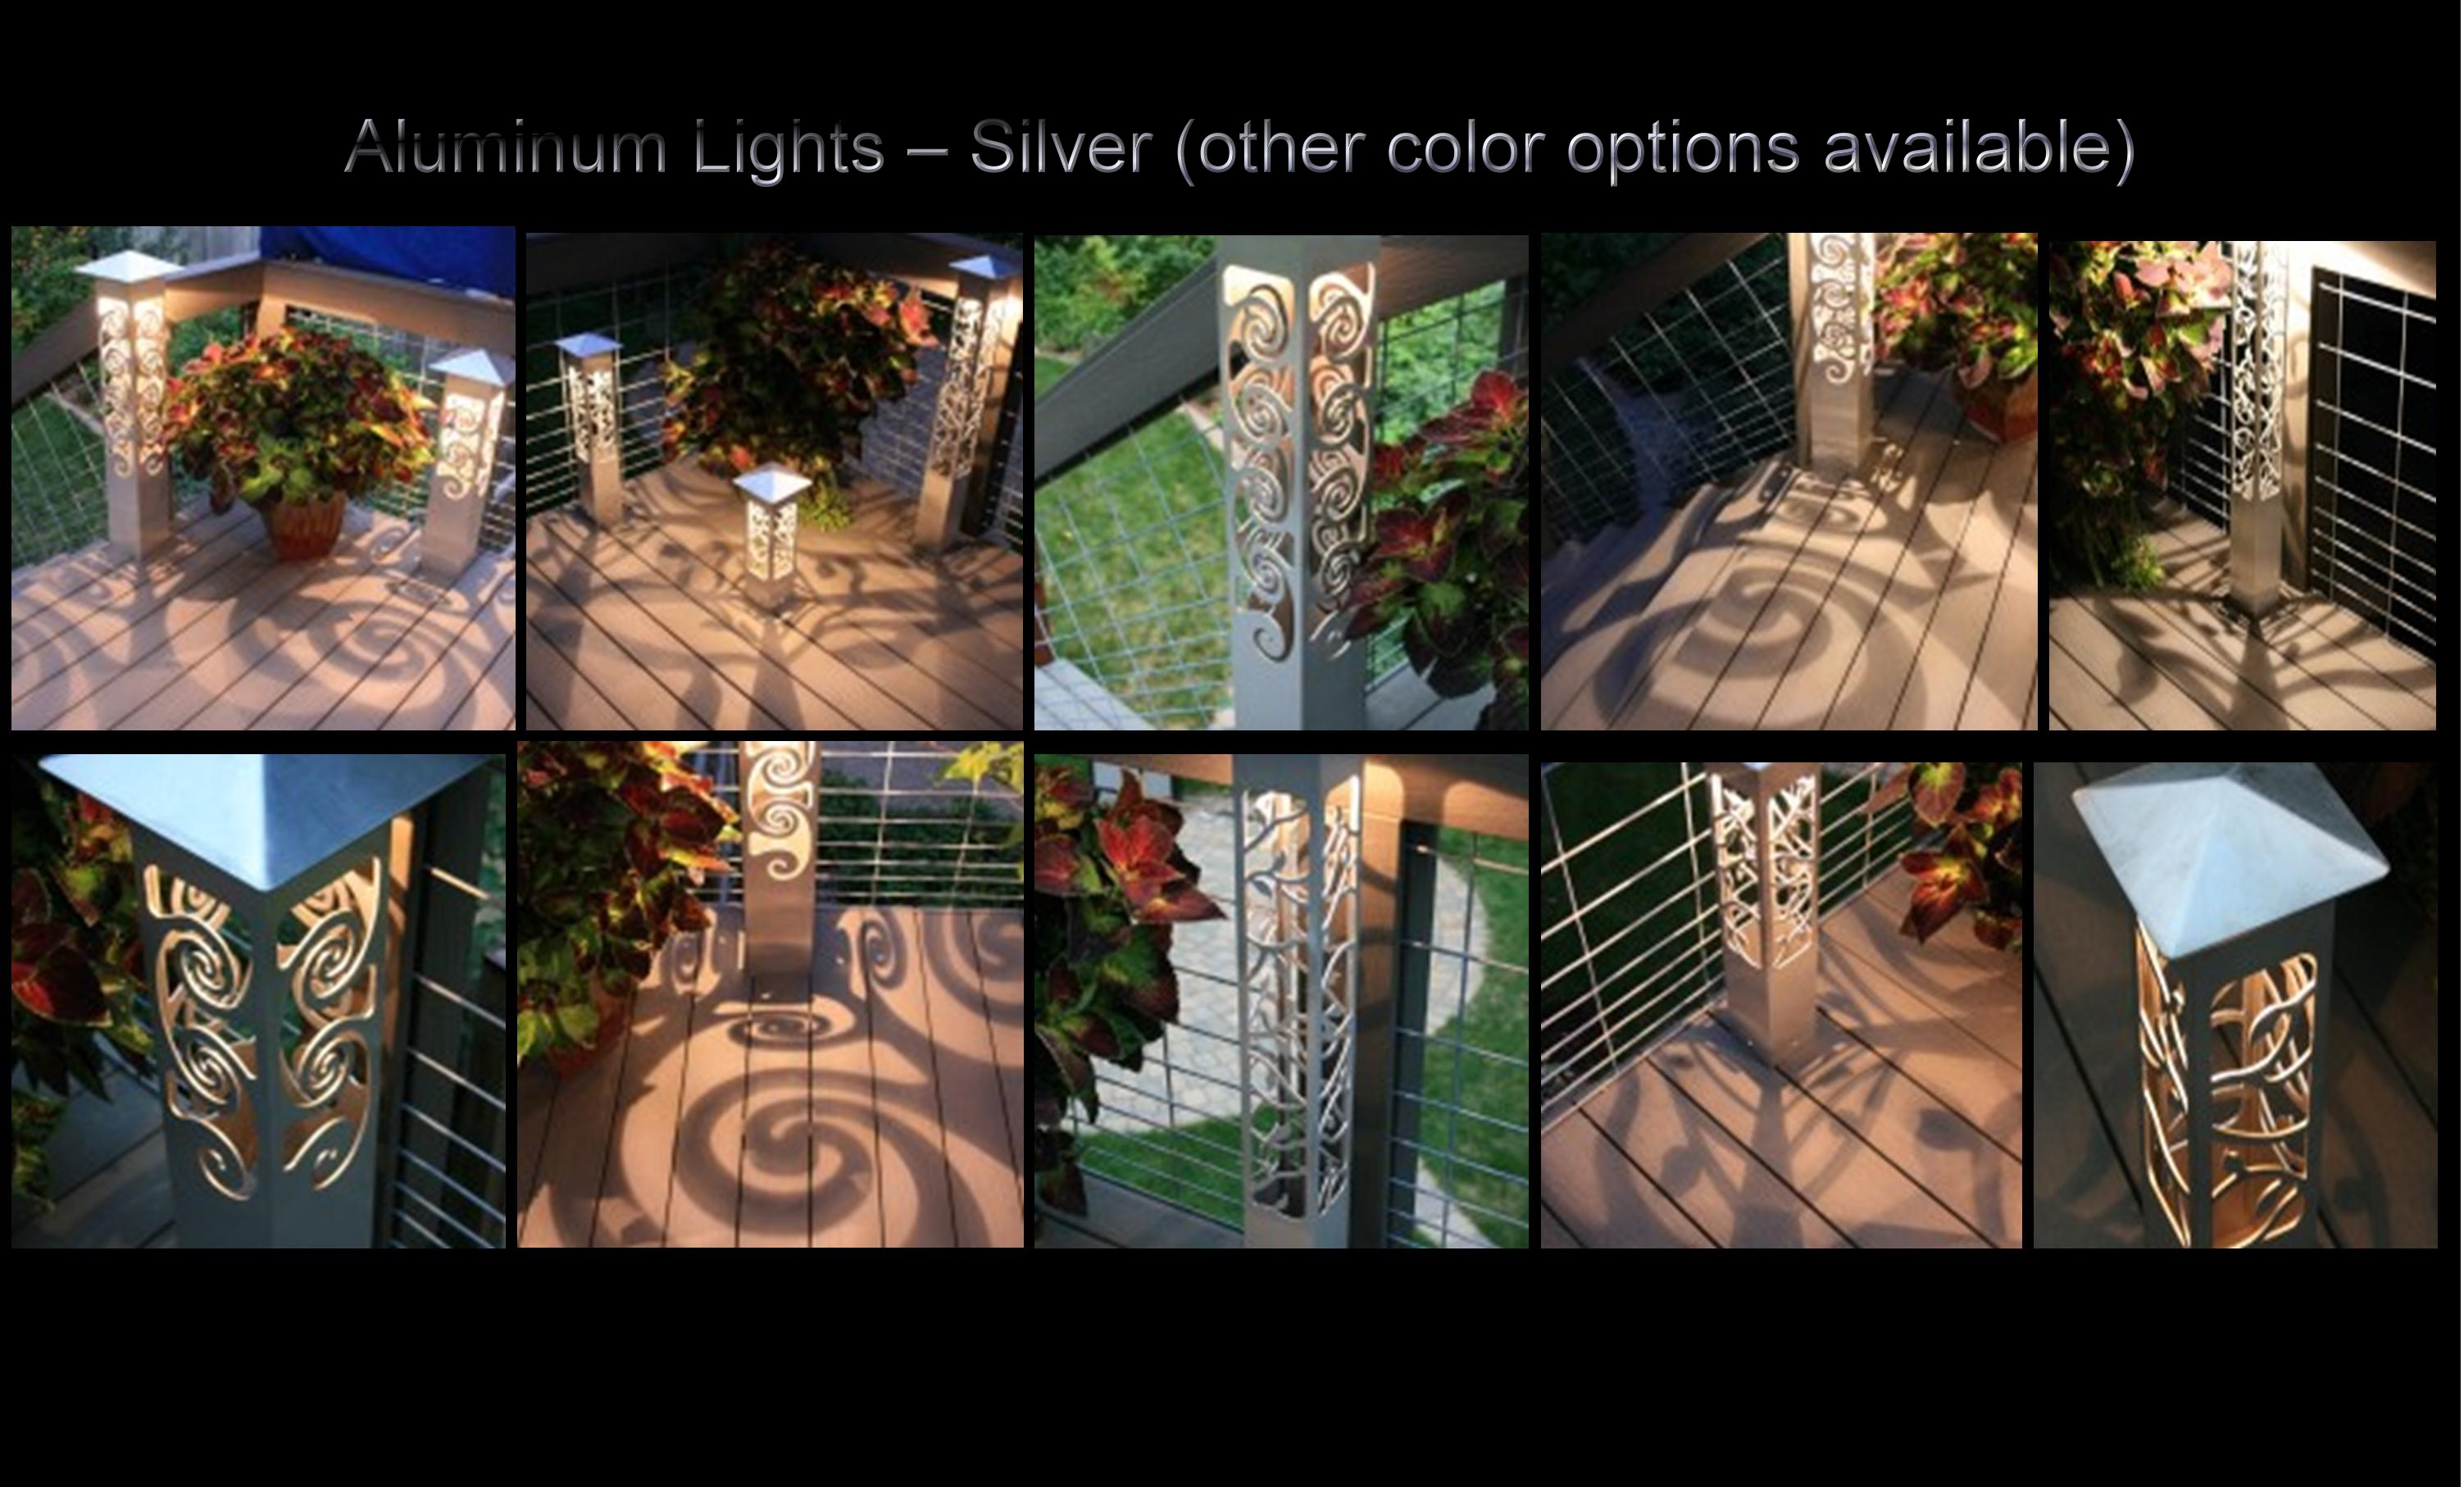 Aluminum Lights